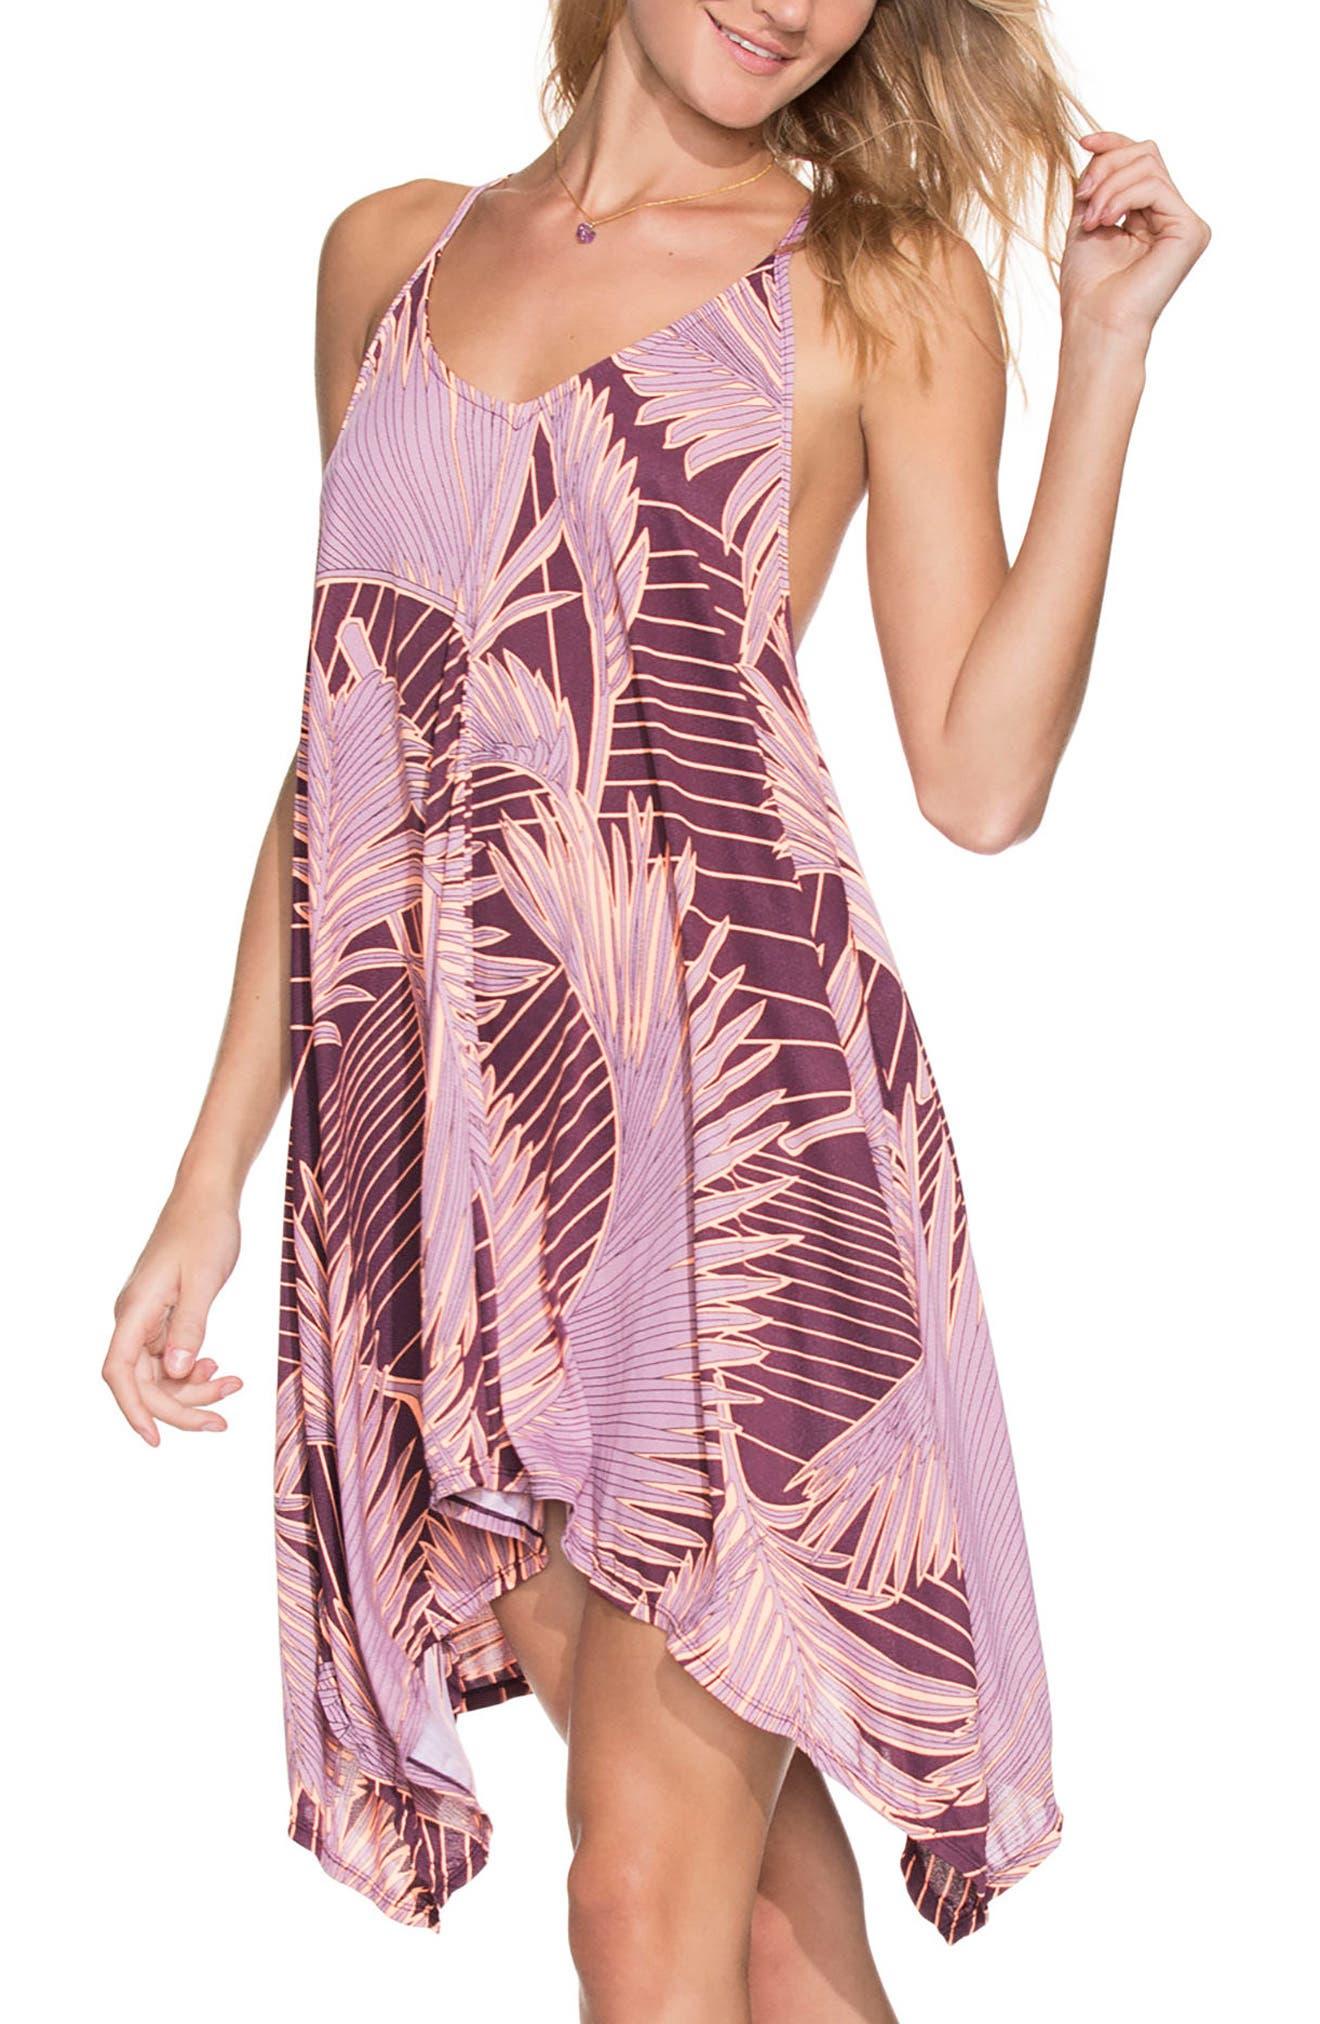 Brilliant Cactus Cover-Up Dress in Burgundy Multi